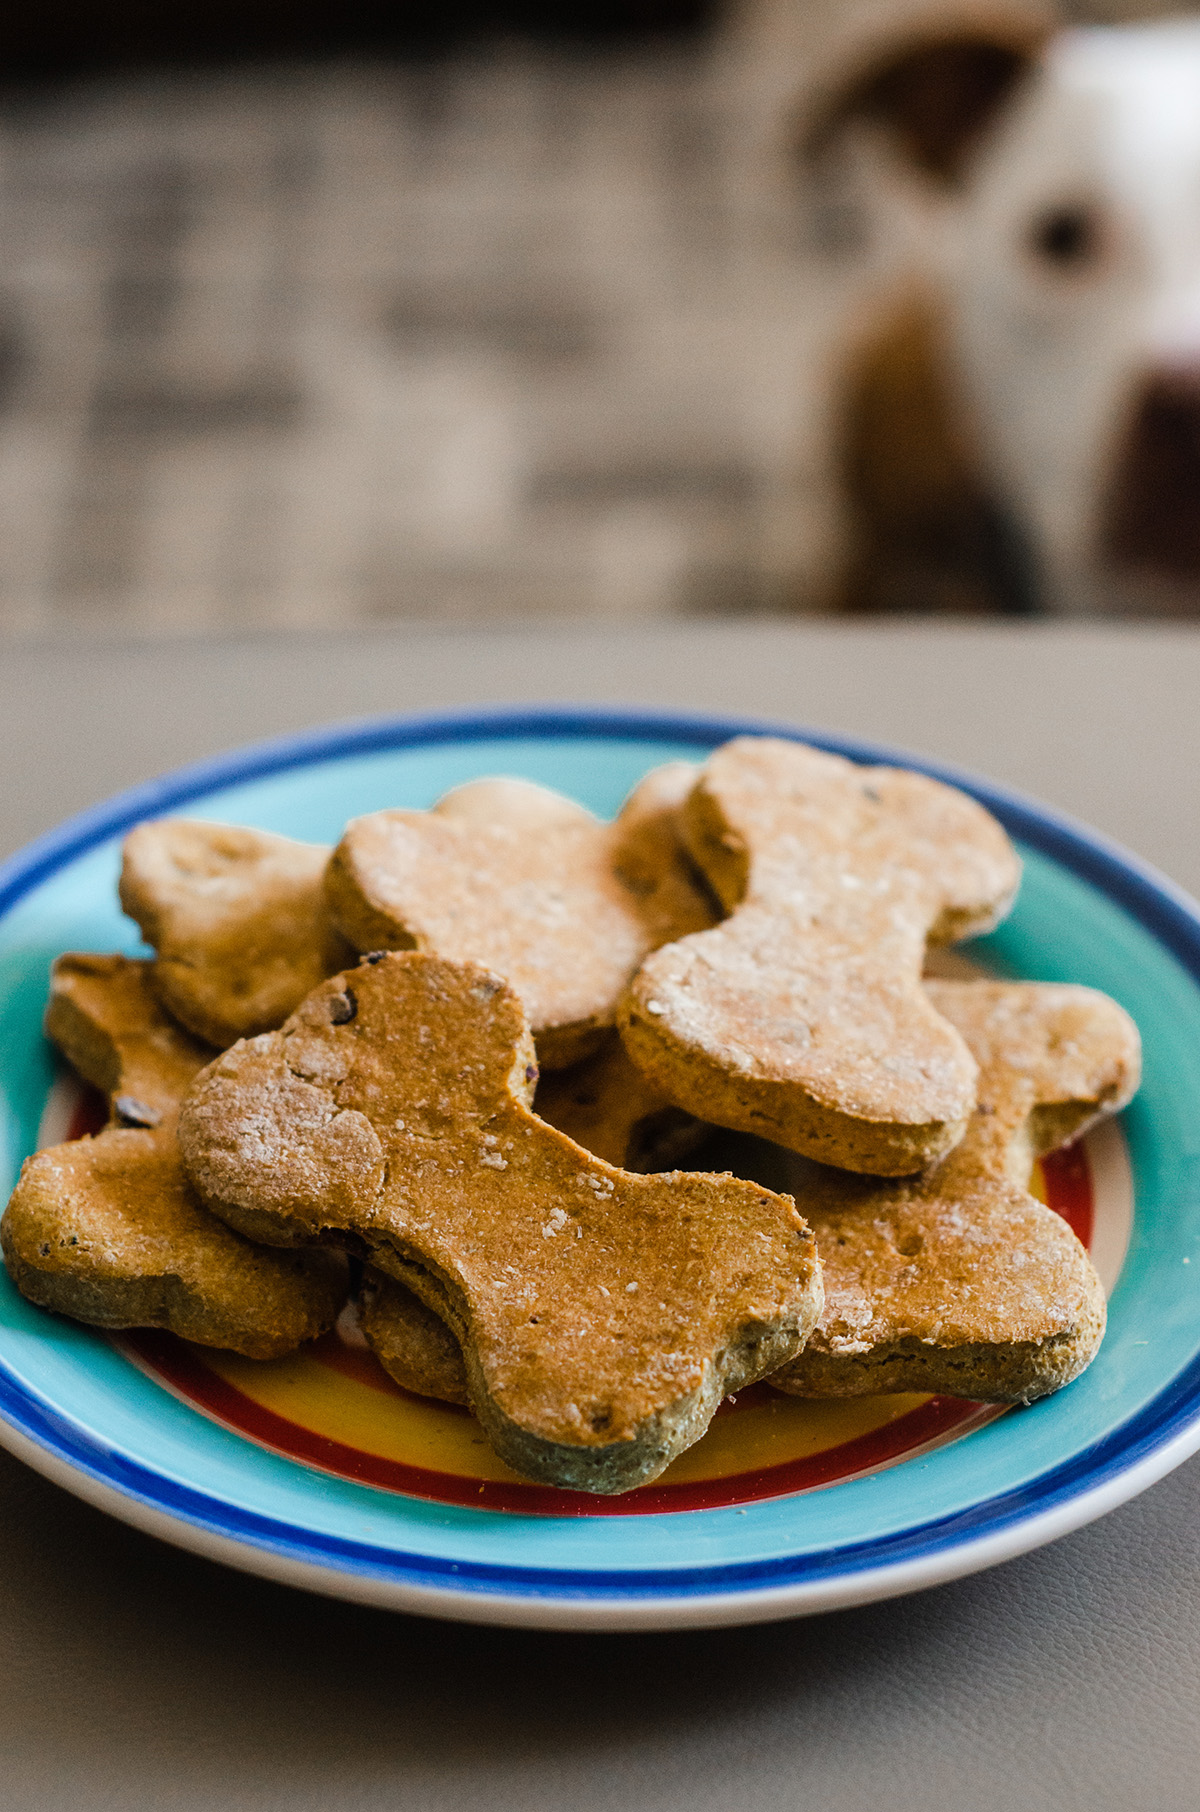 Simple homemade dog treats made with pumpkin puree, whole wheat flour, and bacon.